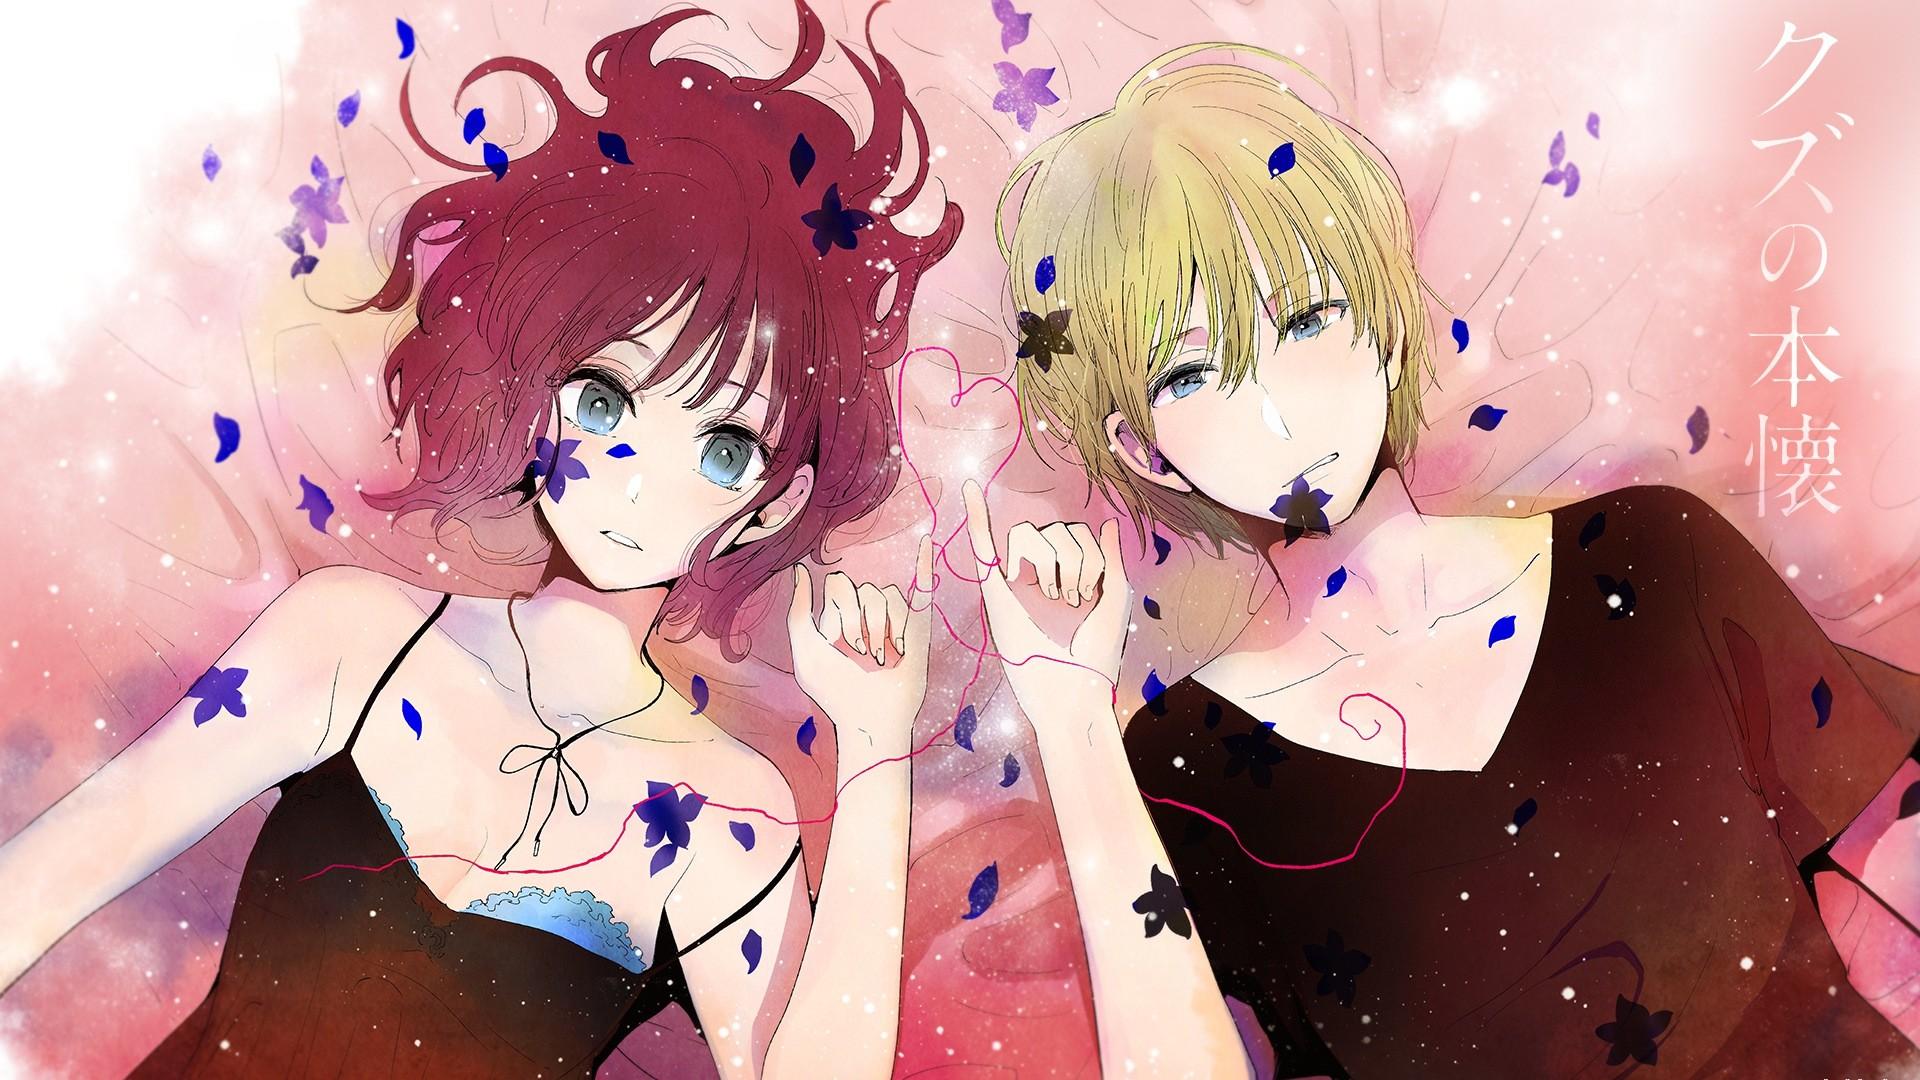 Nanatsu No Taizai the Seven Deadly Sins, Anime, Elizabeth Liones, Diane, Ban